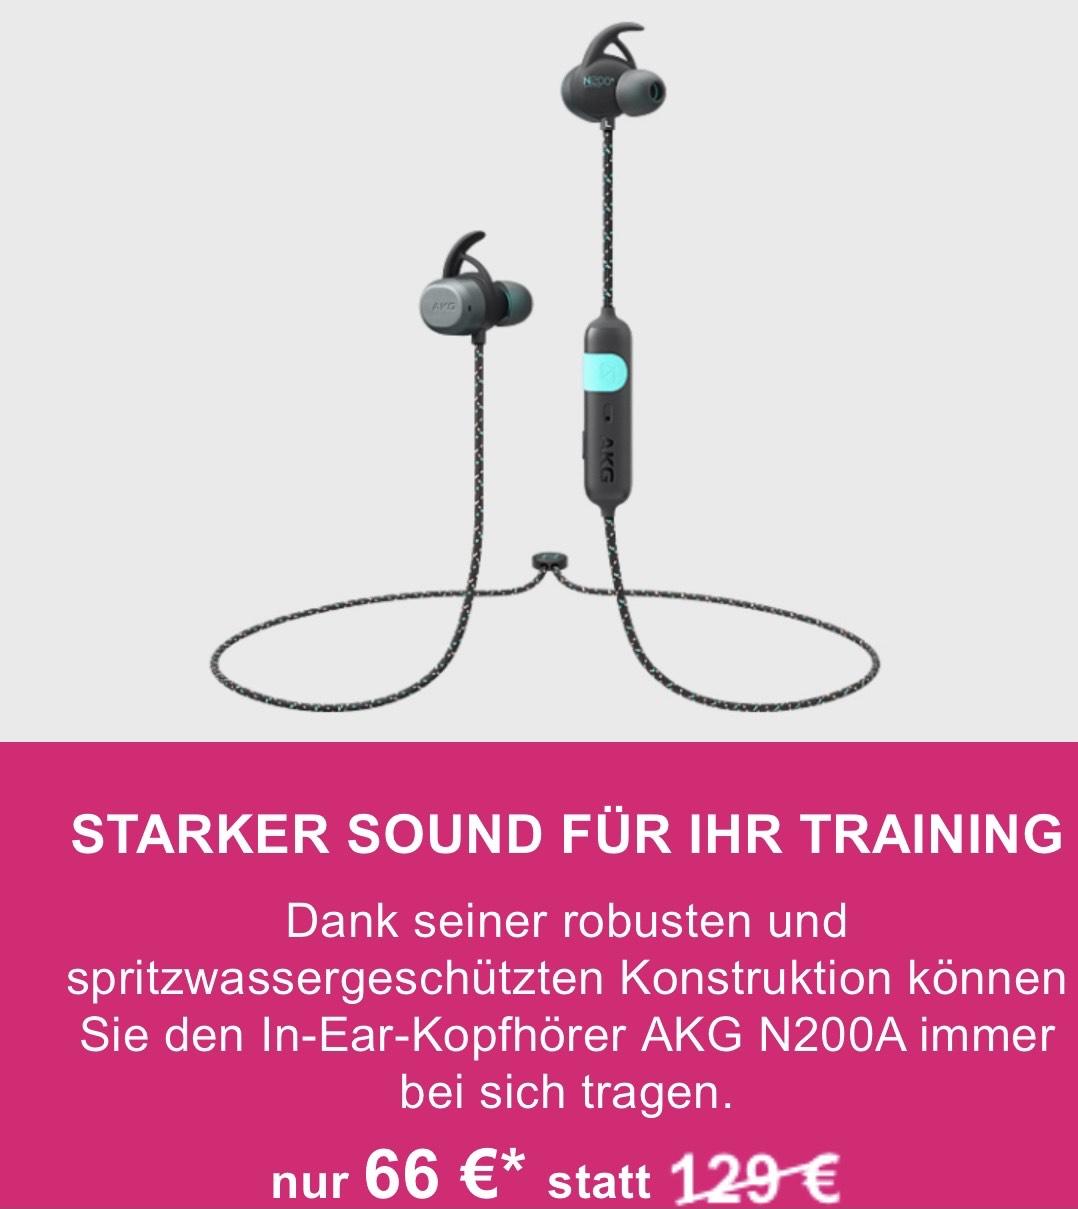 Samsung Wireless In-Ear-Kopfhörer AKG N200A [TELEKOM SHOP]